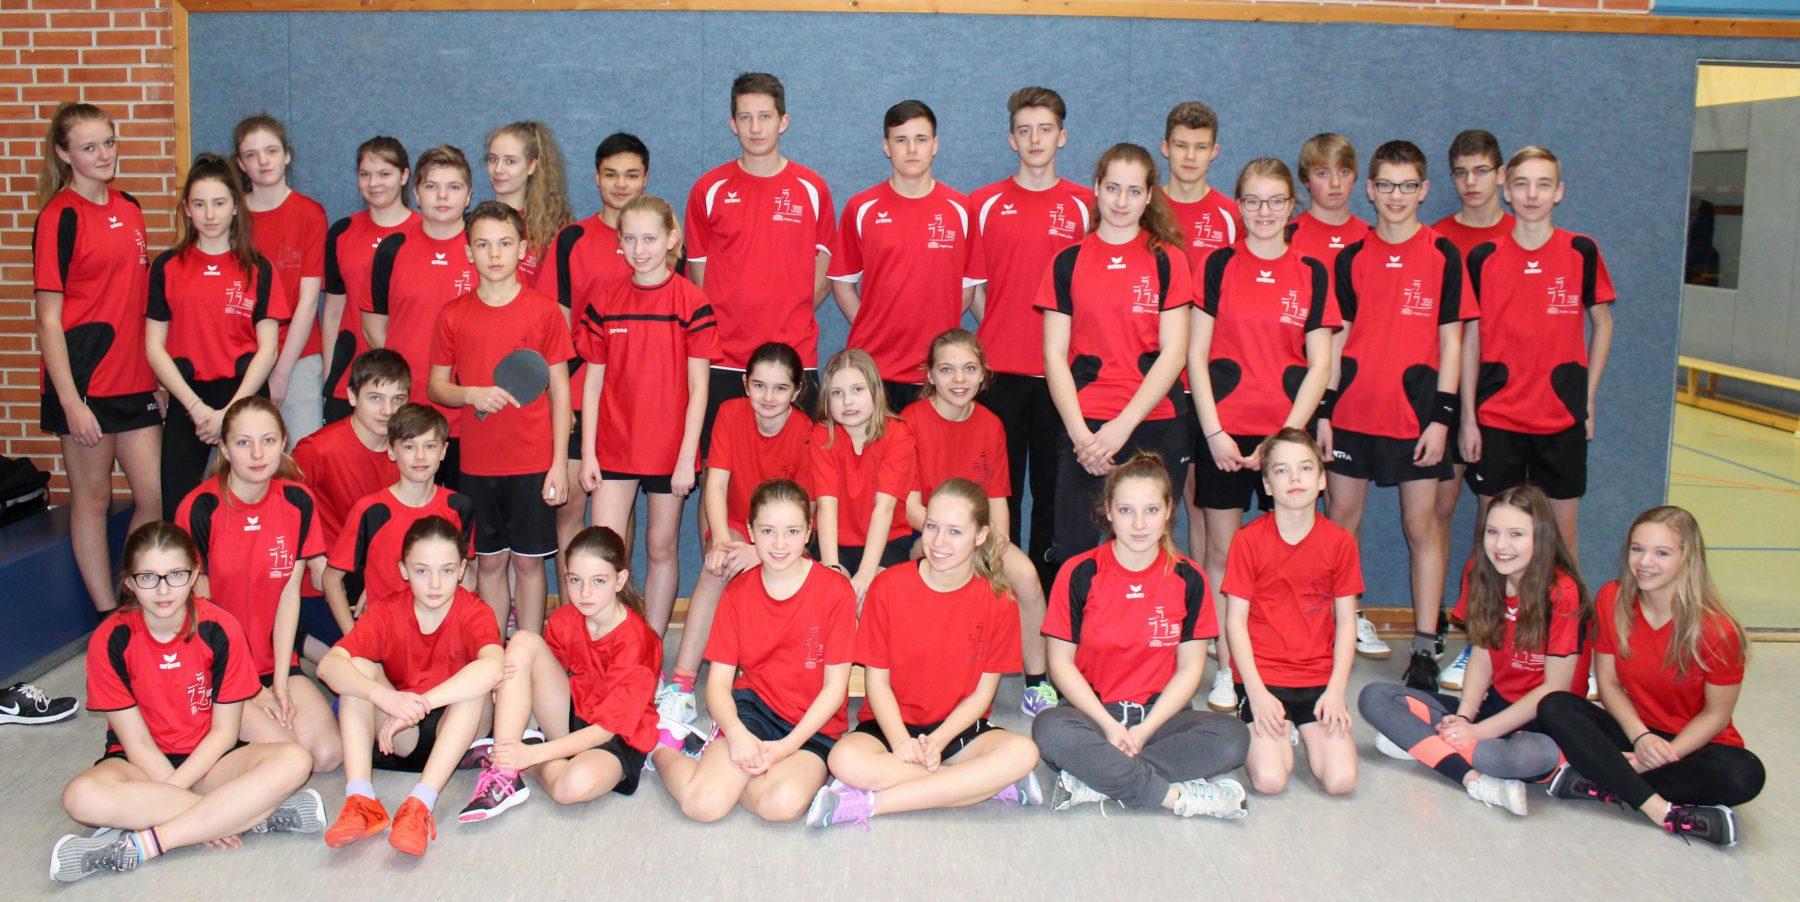 GSS Tischtennisspieler/innen glänzen beim JtfO-Bezirksentscheid